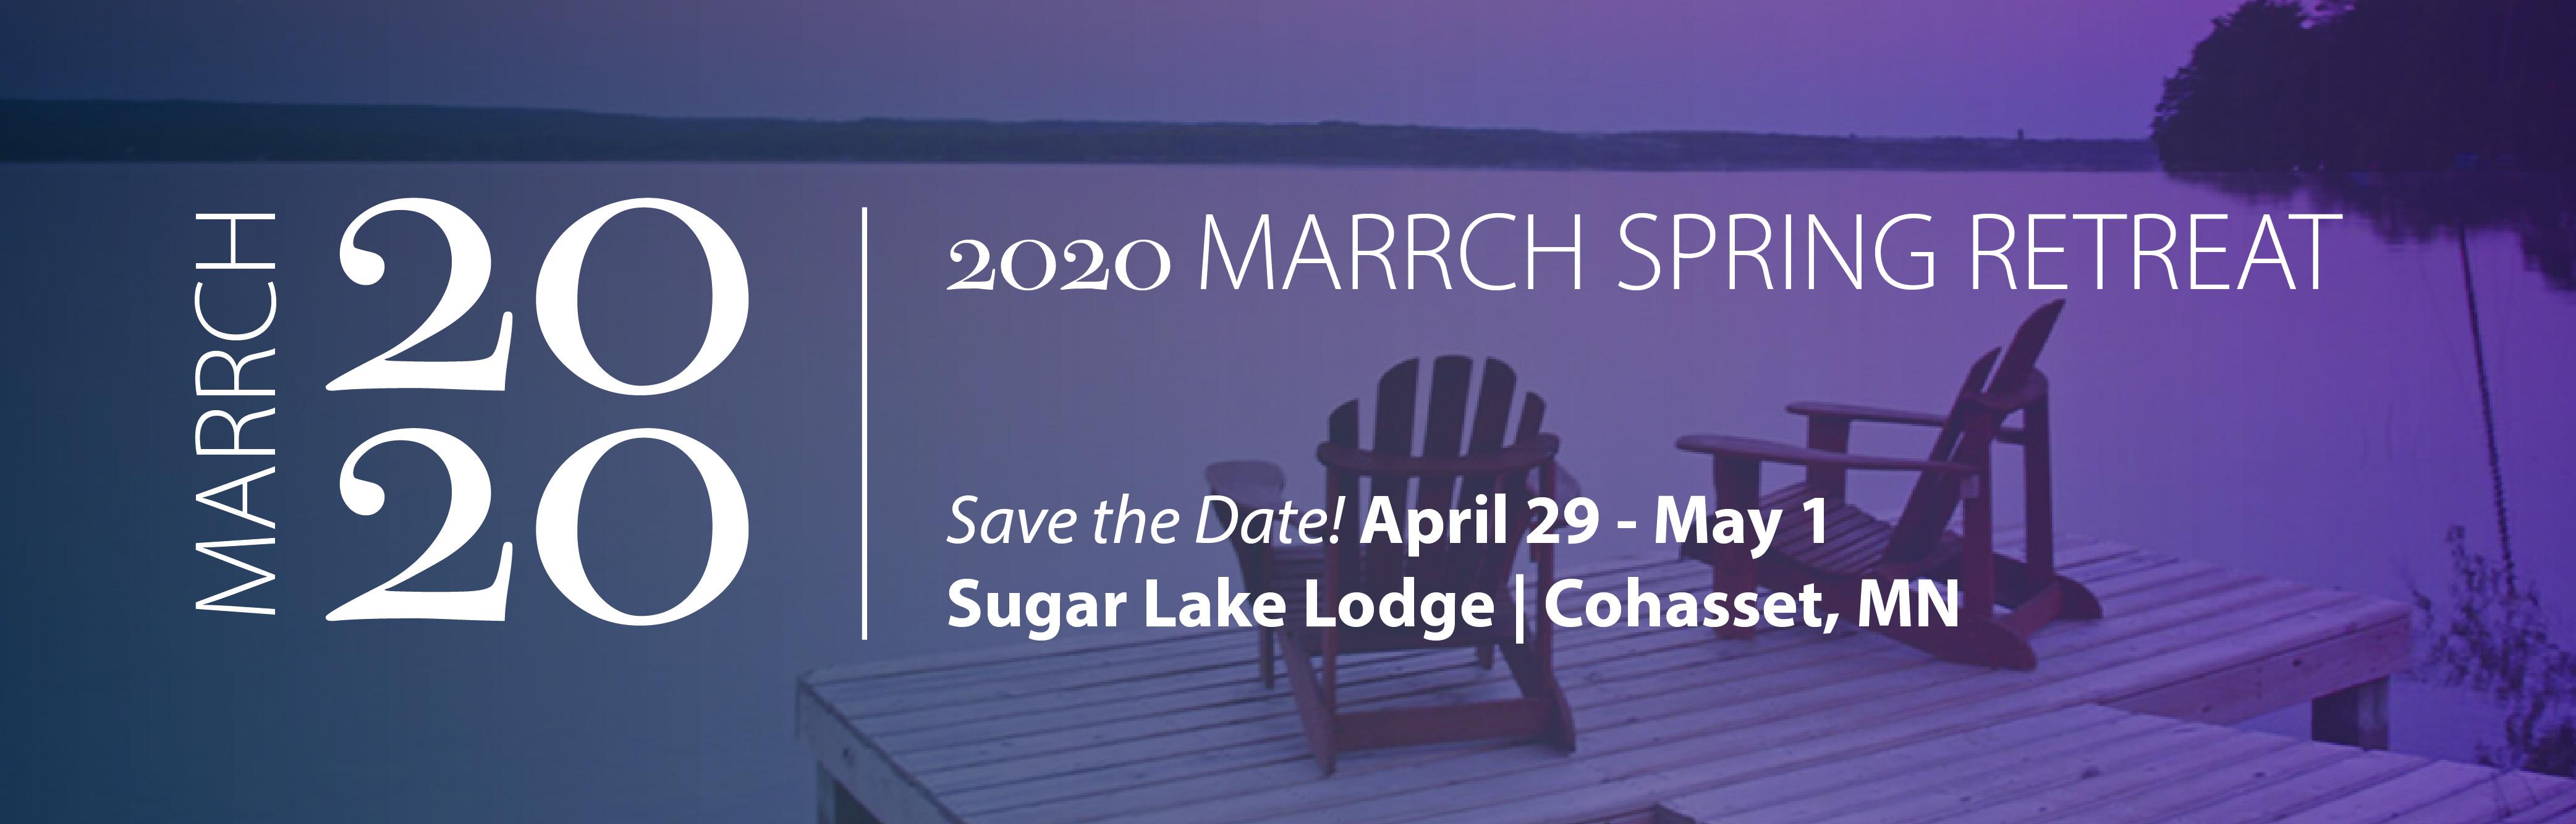 MARRCH Spring Retreat